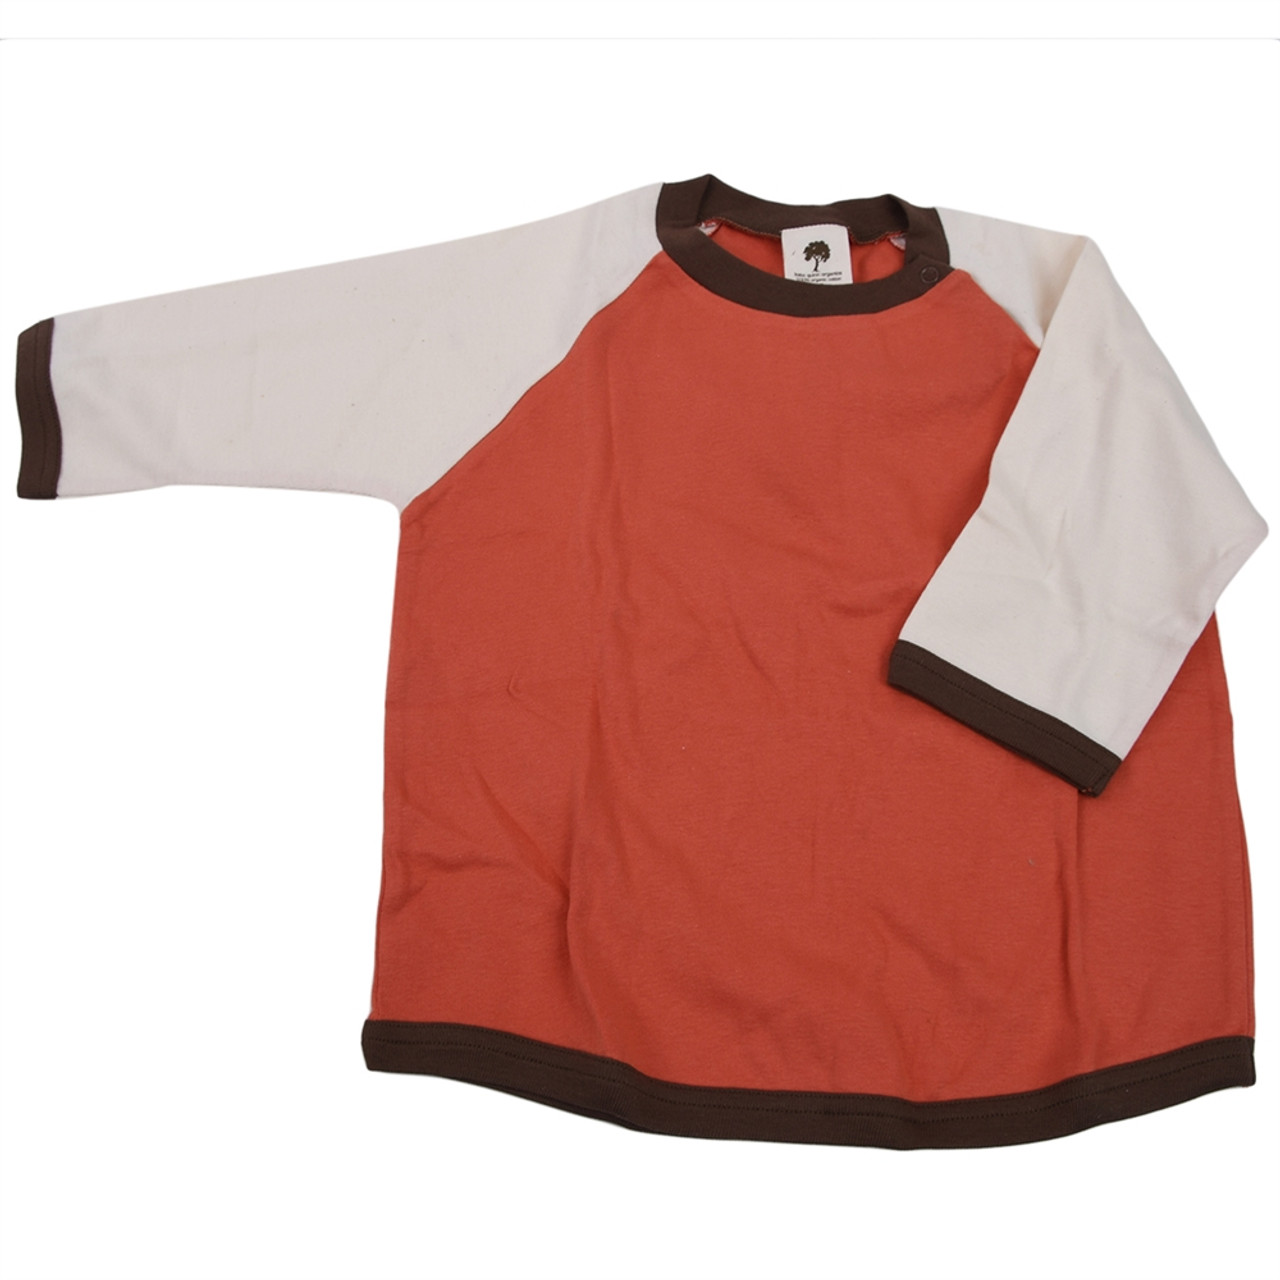 Kate Quinn Organic Toddler Clothes - Orange 4t